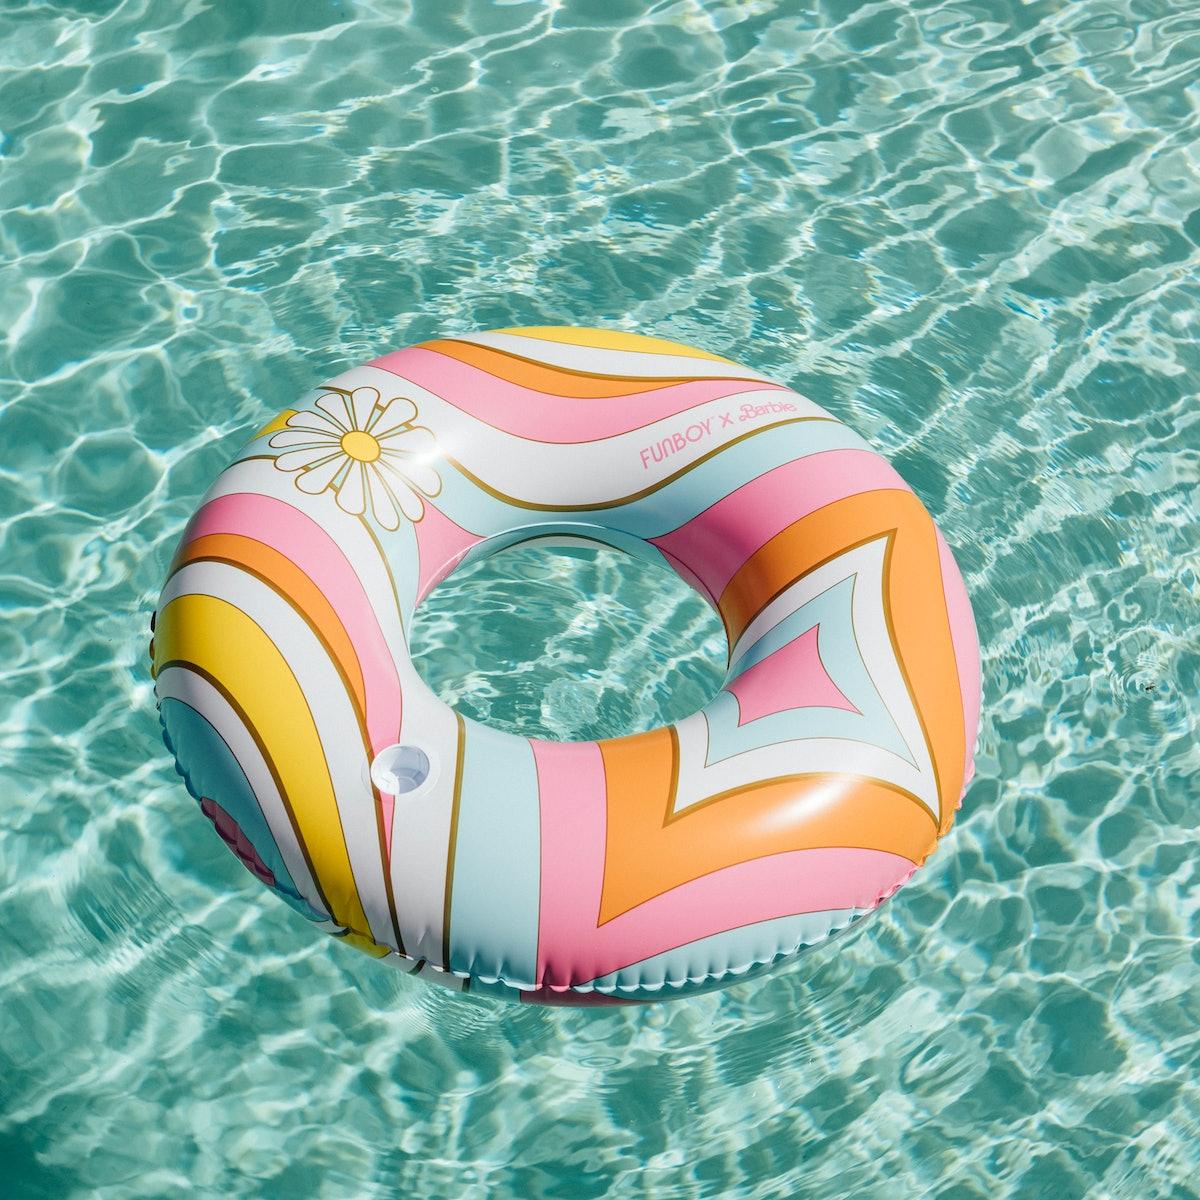 FUNBOY x Malibu Barbie Tube Pool Float